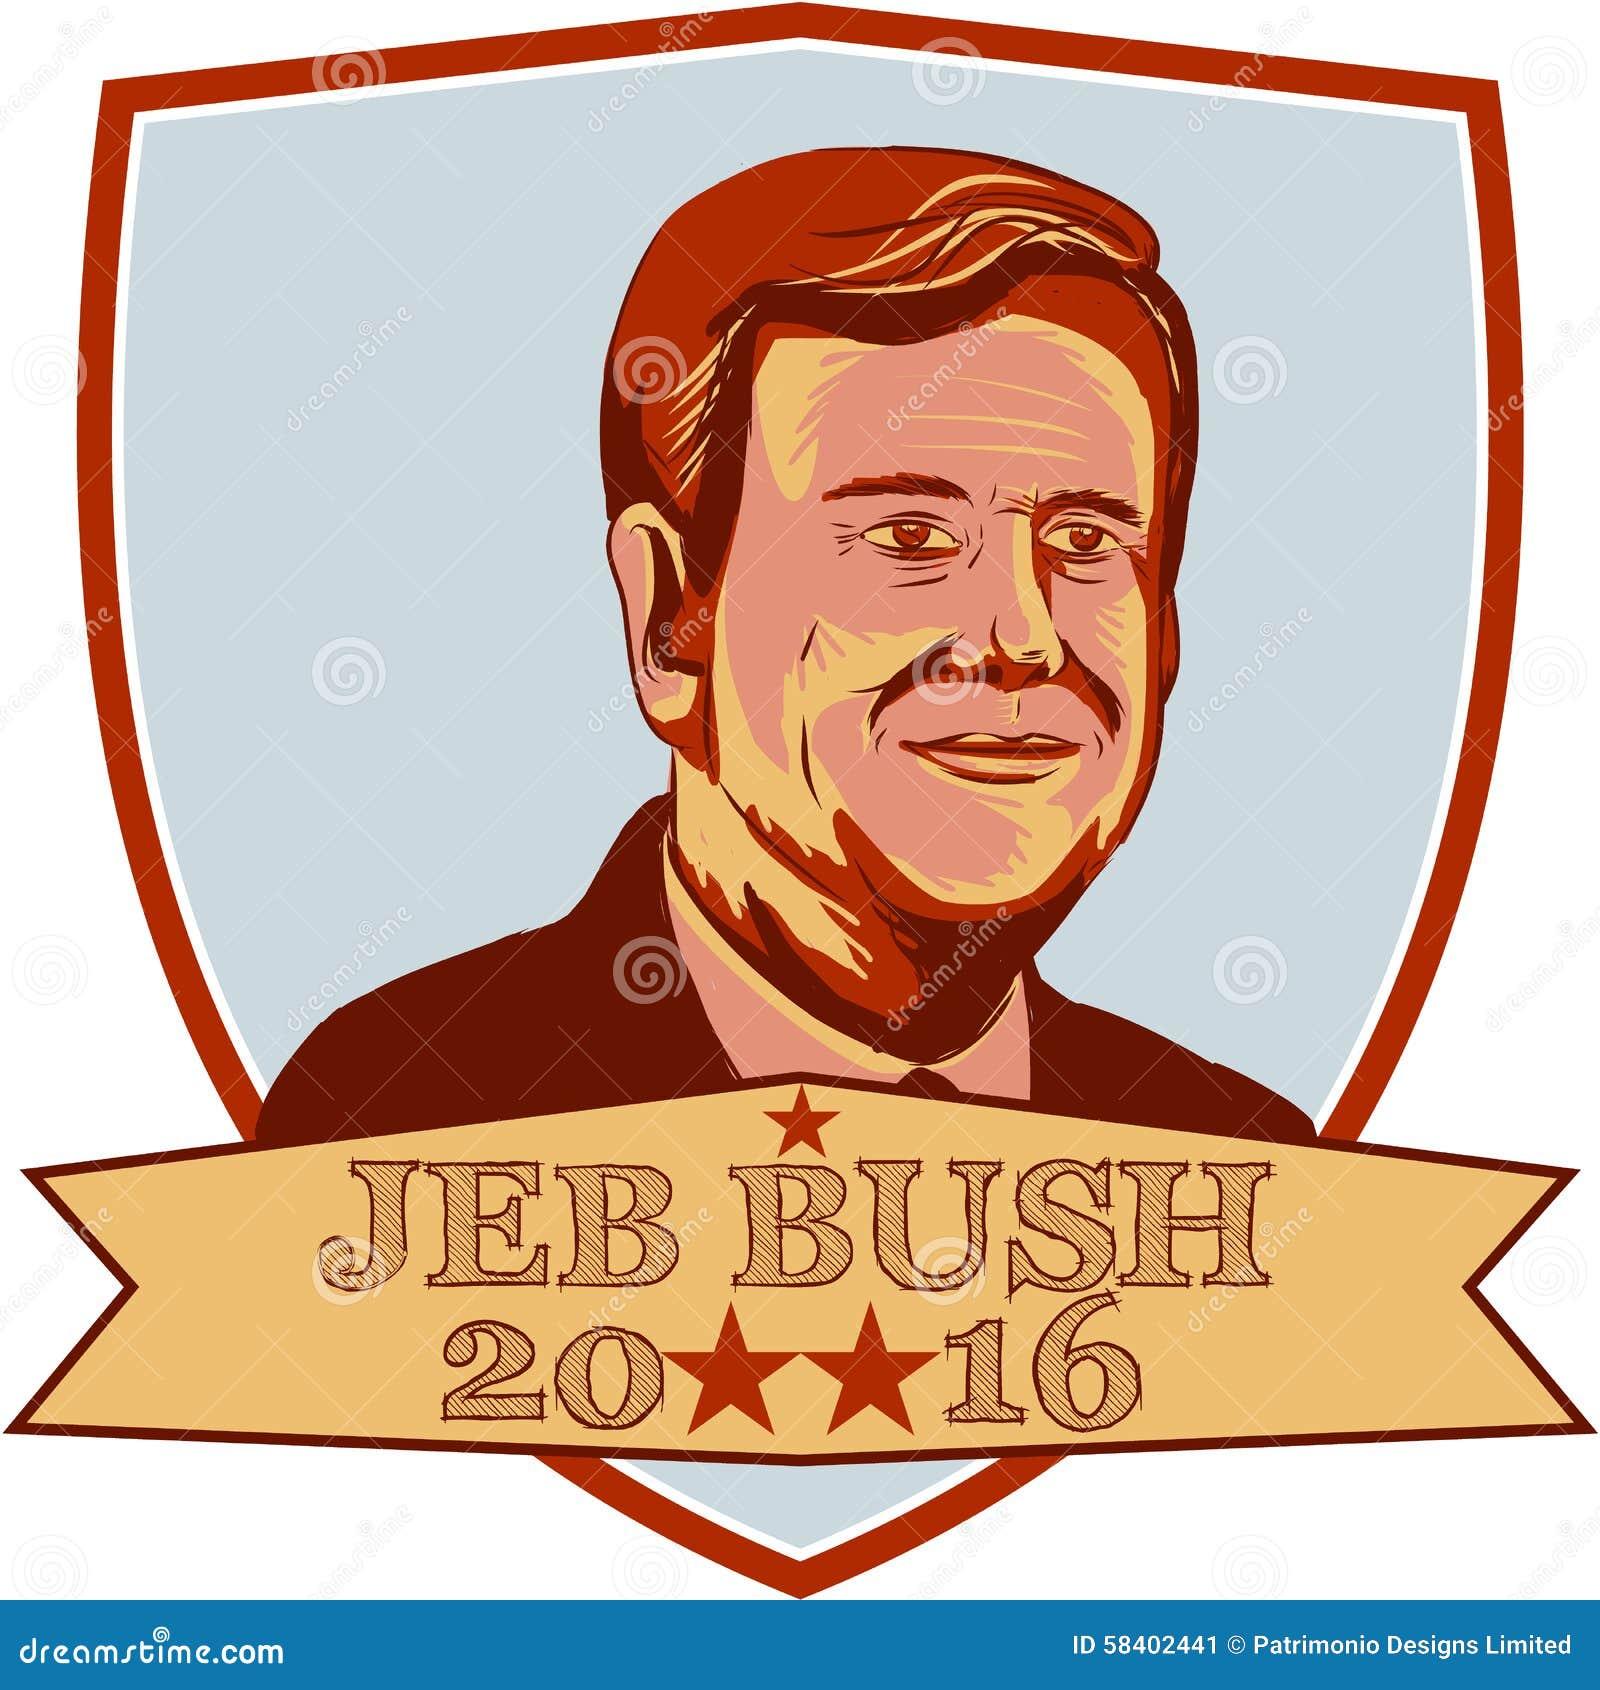 jeb bush president 2016 shield editorial photo illustration of